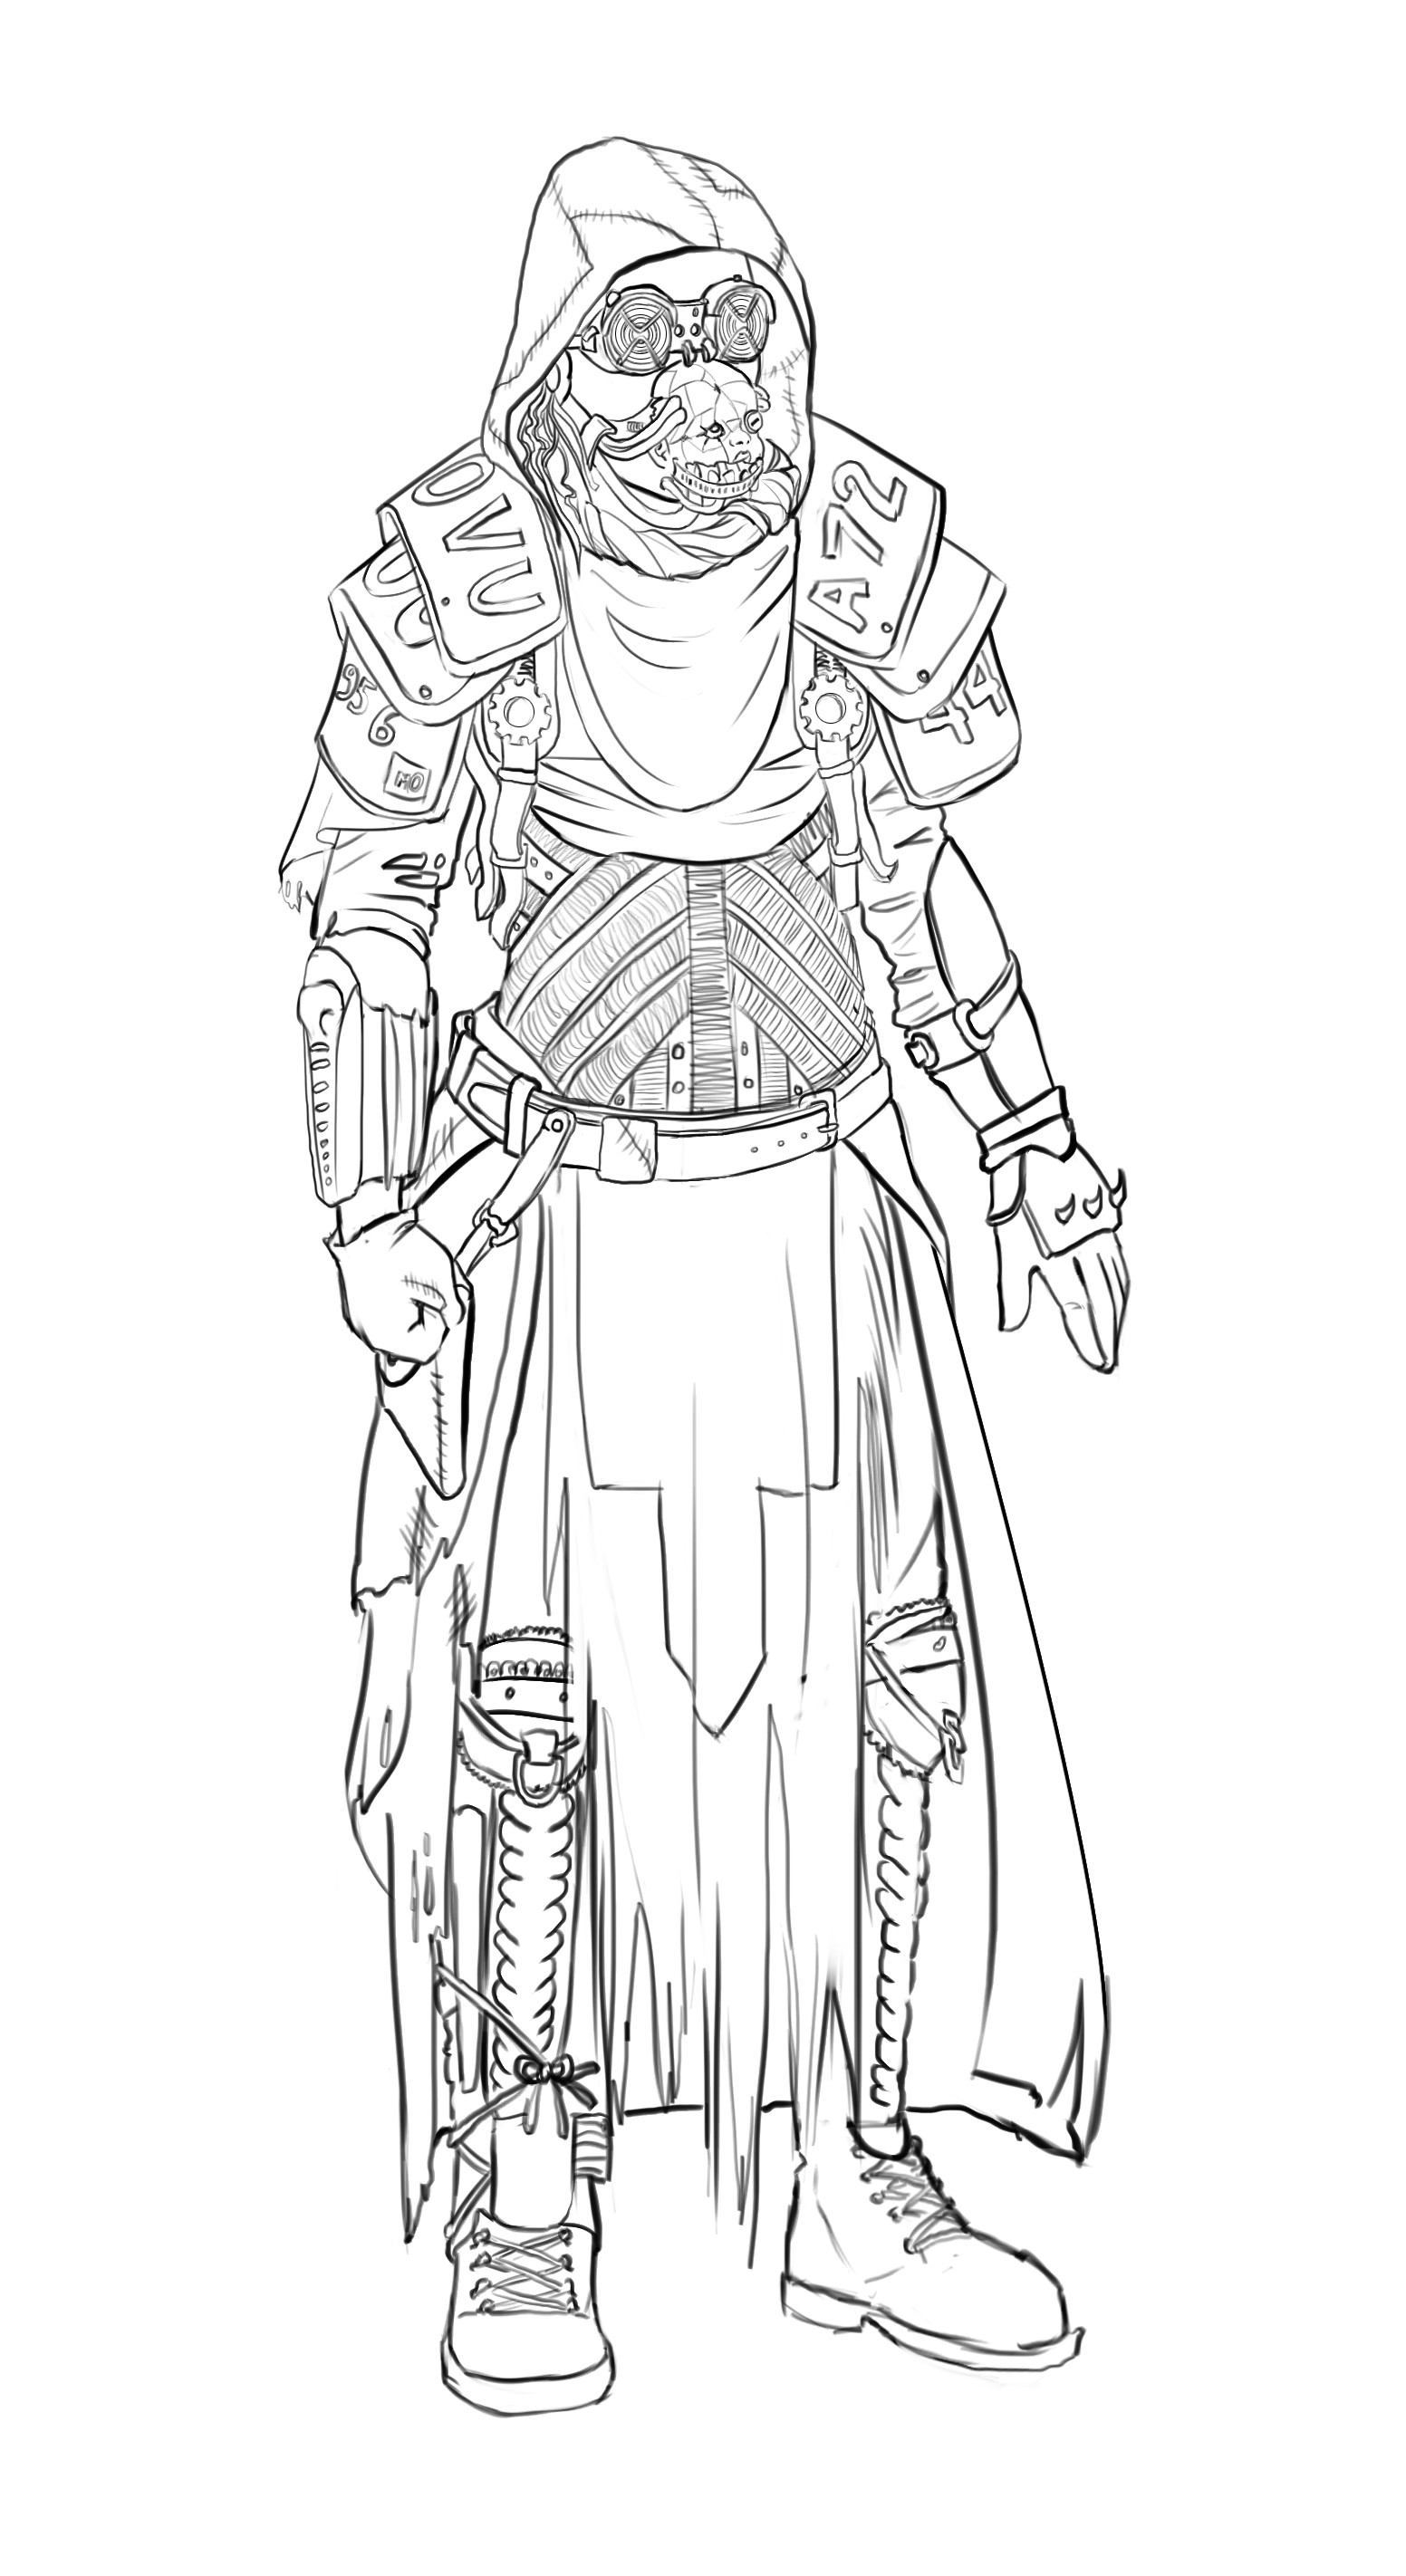 Elizabeth ware character1 lineart